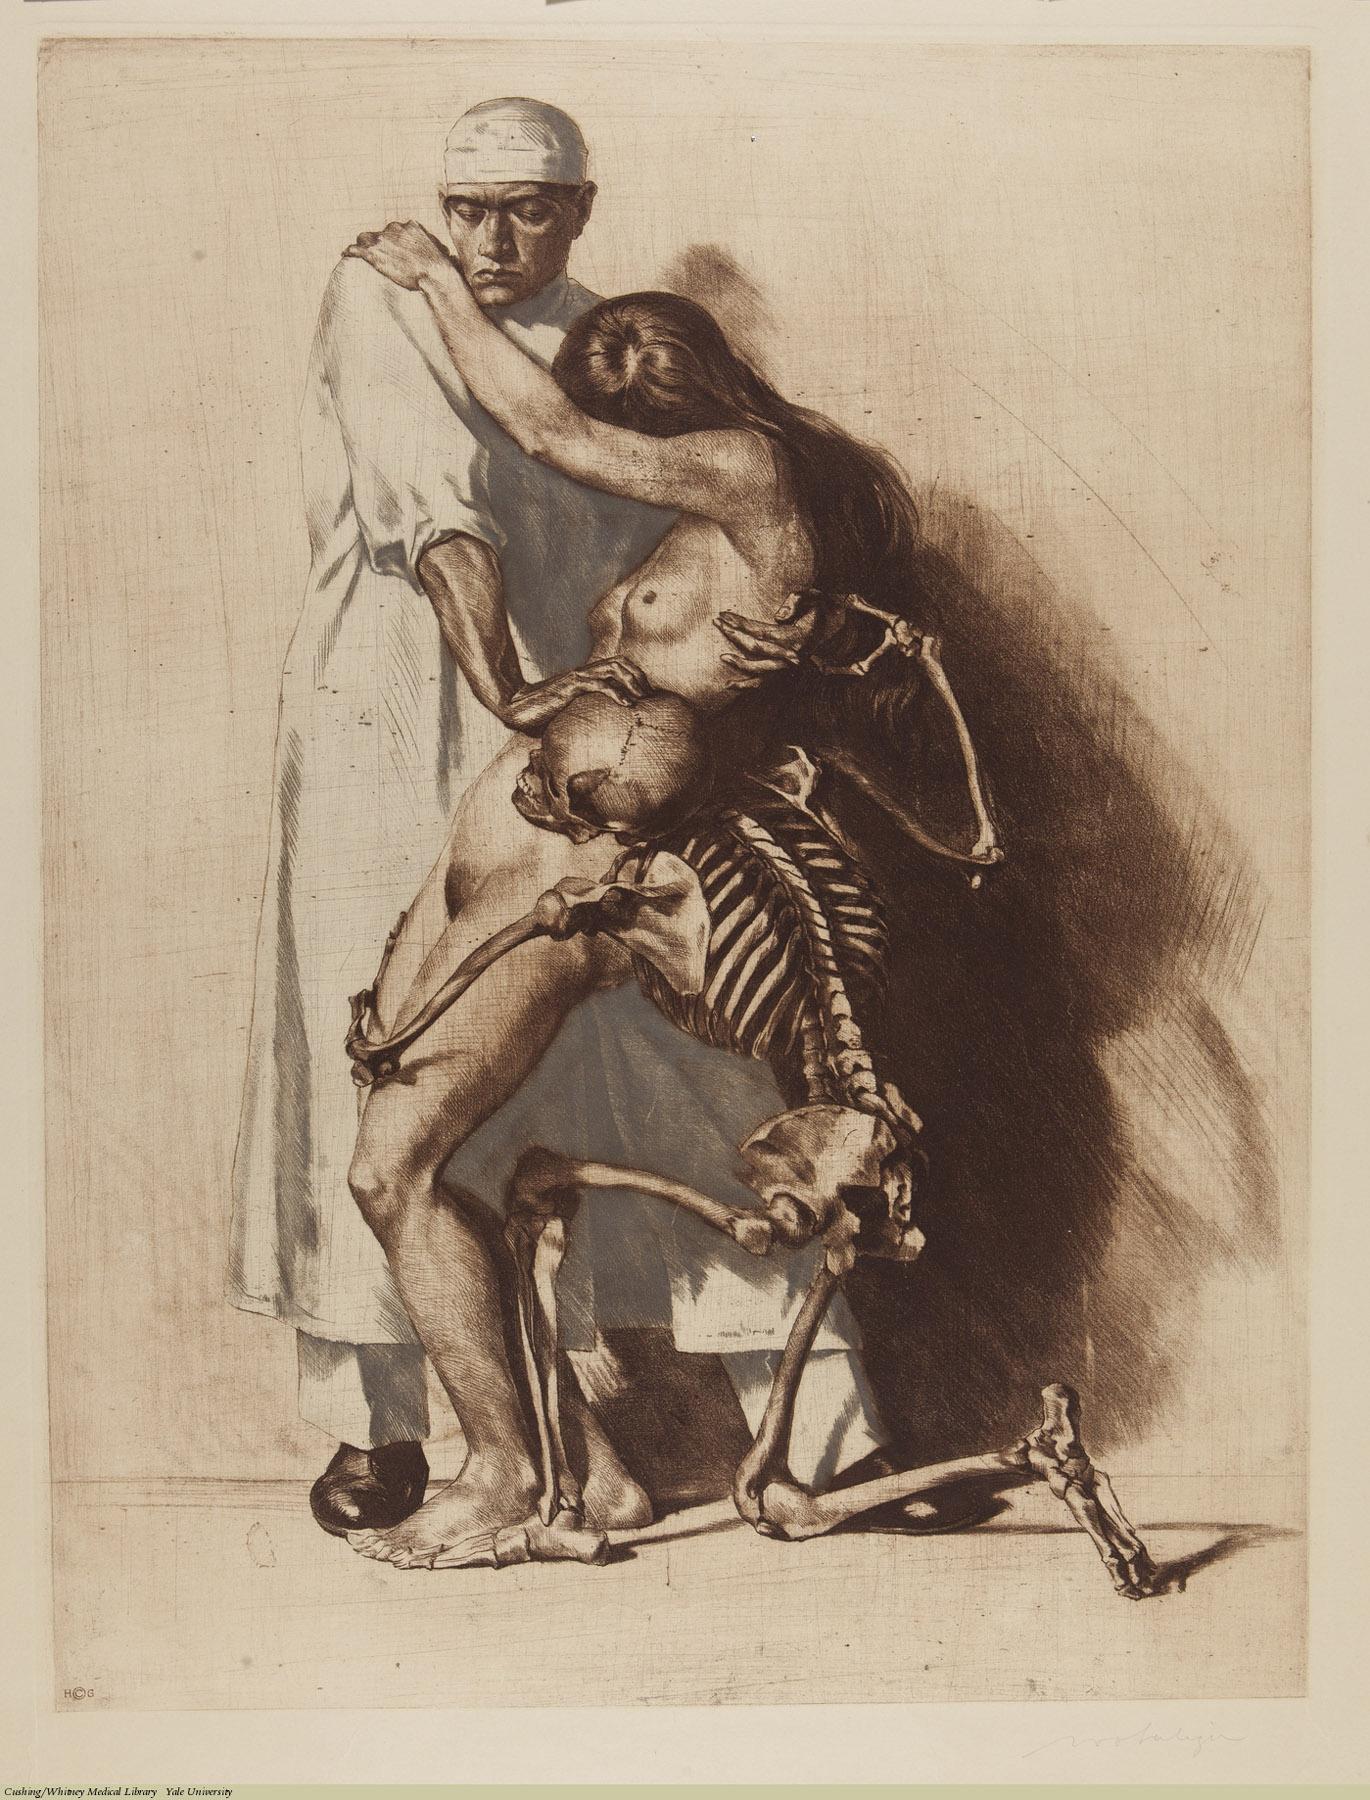 Der Arzt. Ivo Saliger, 1921. Subject: Skeleton As Death, Surgeons, Surgery.